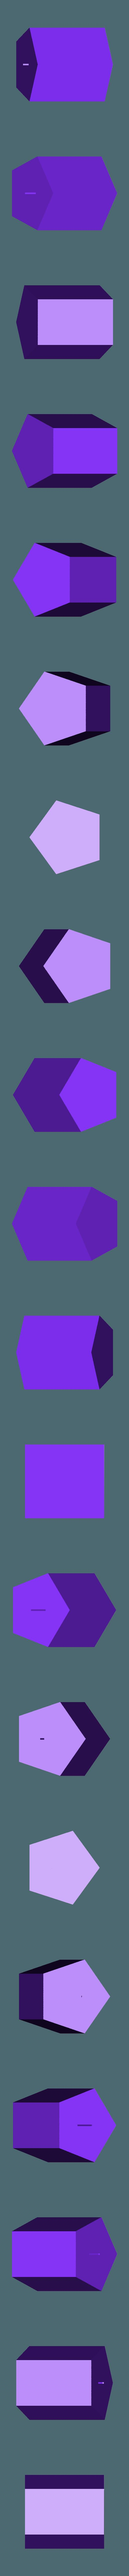 Bank1.STL Download free STL file Coin Bank • 3D print design, Mendelssohn